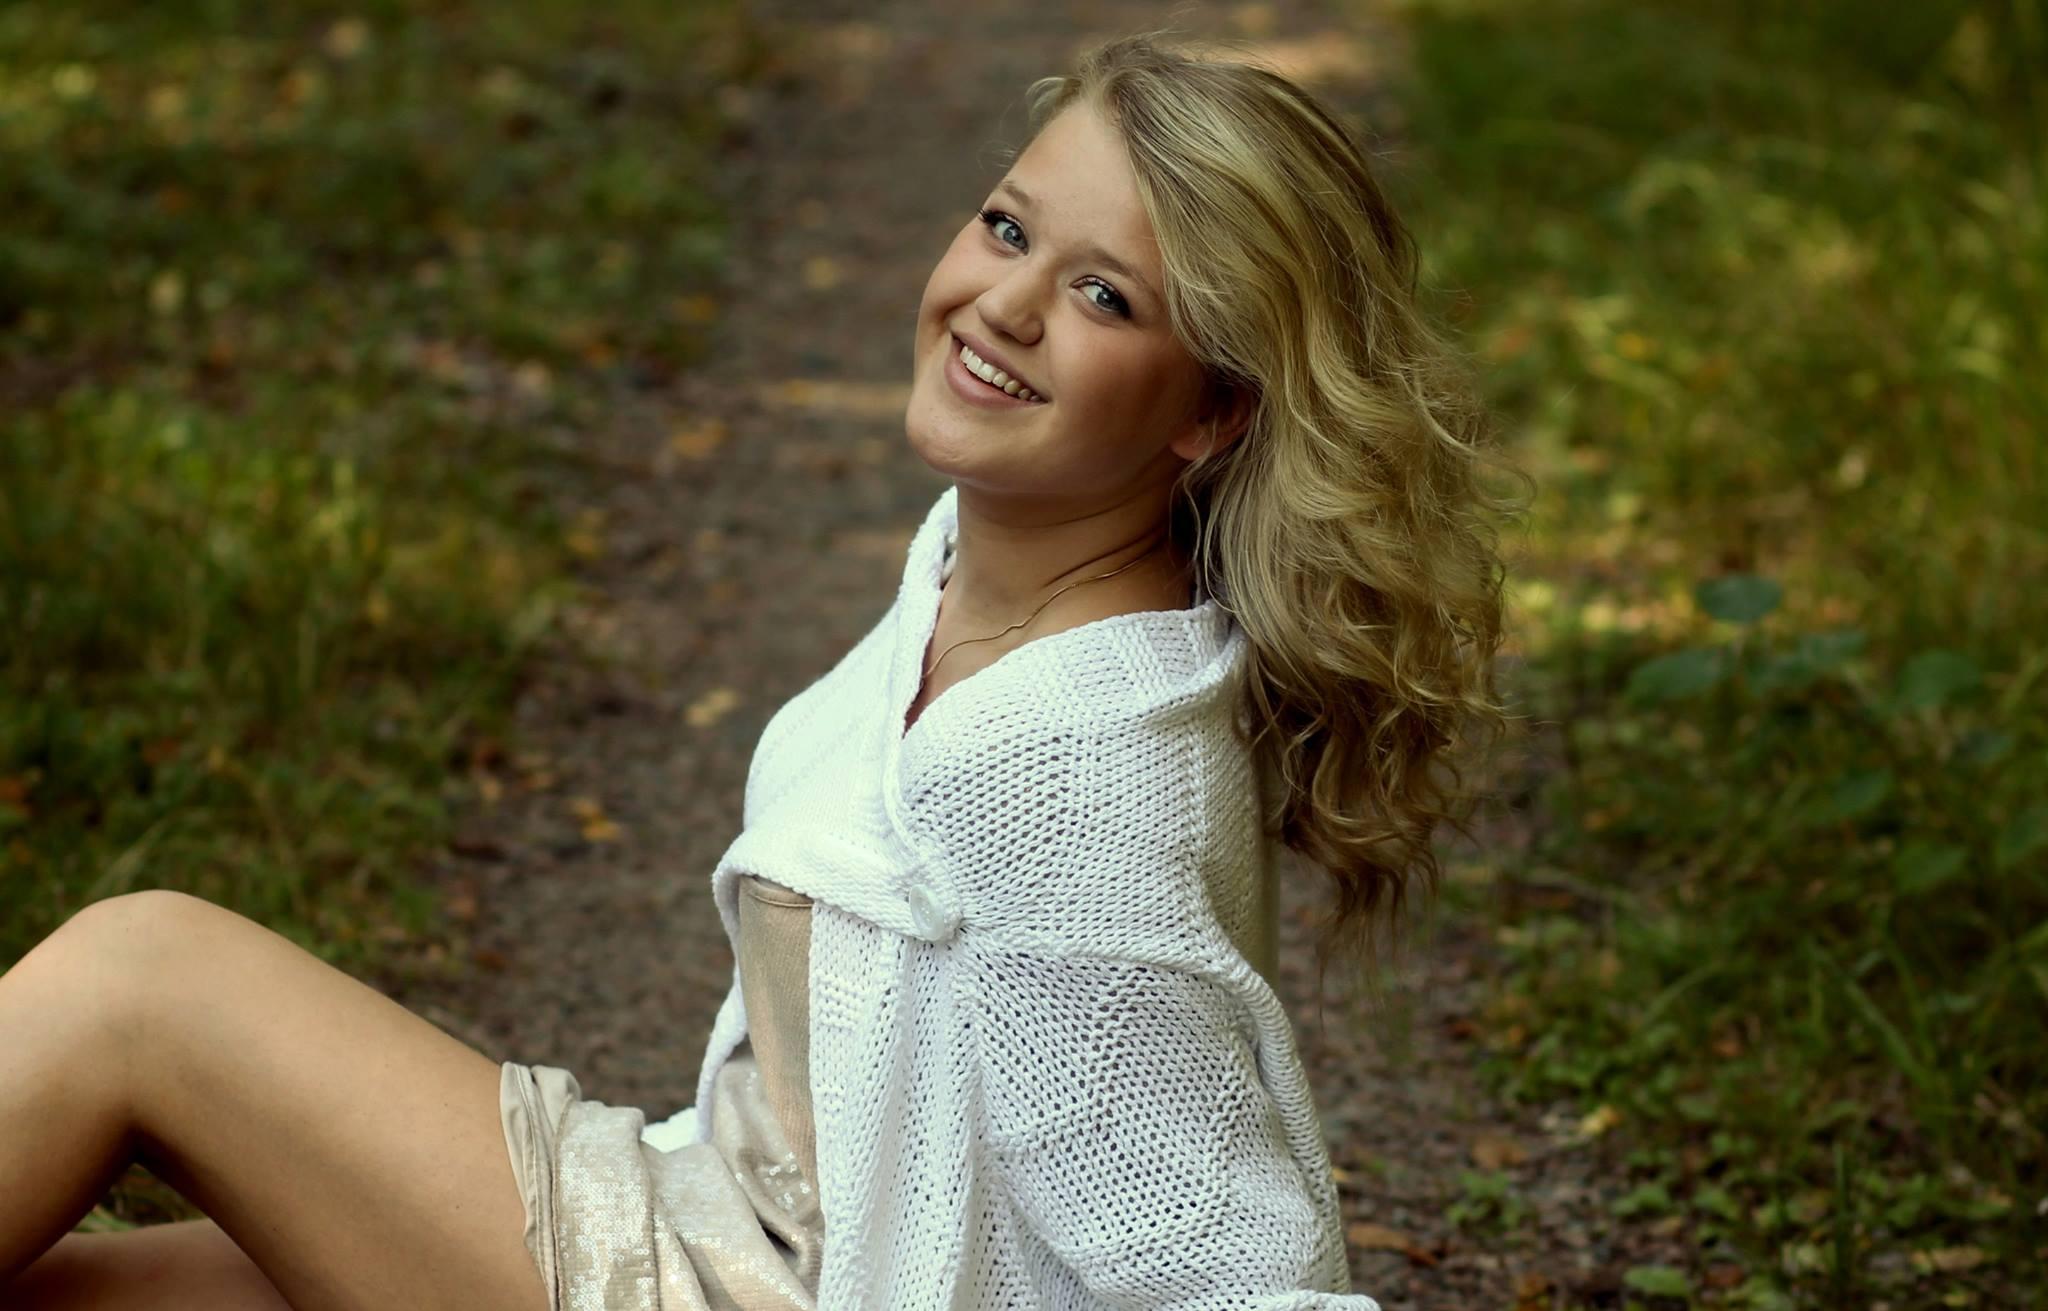 Actress-Singer-Songwriter Linnea Persson